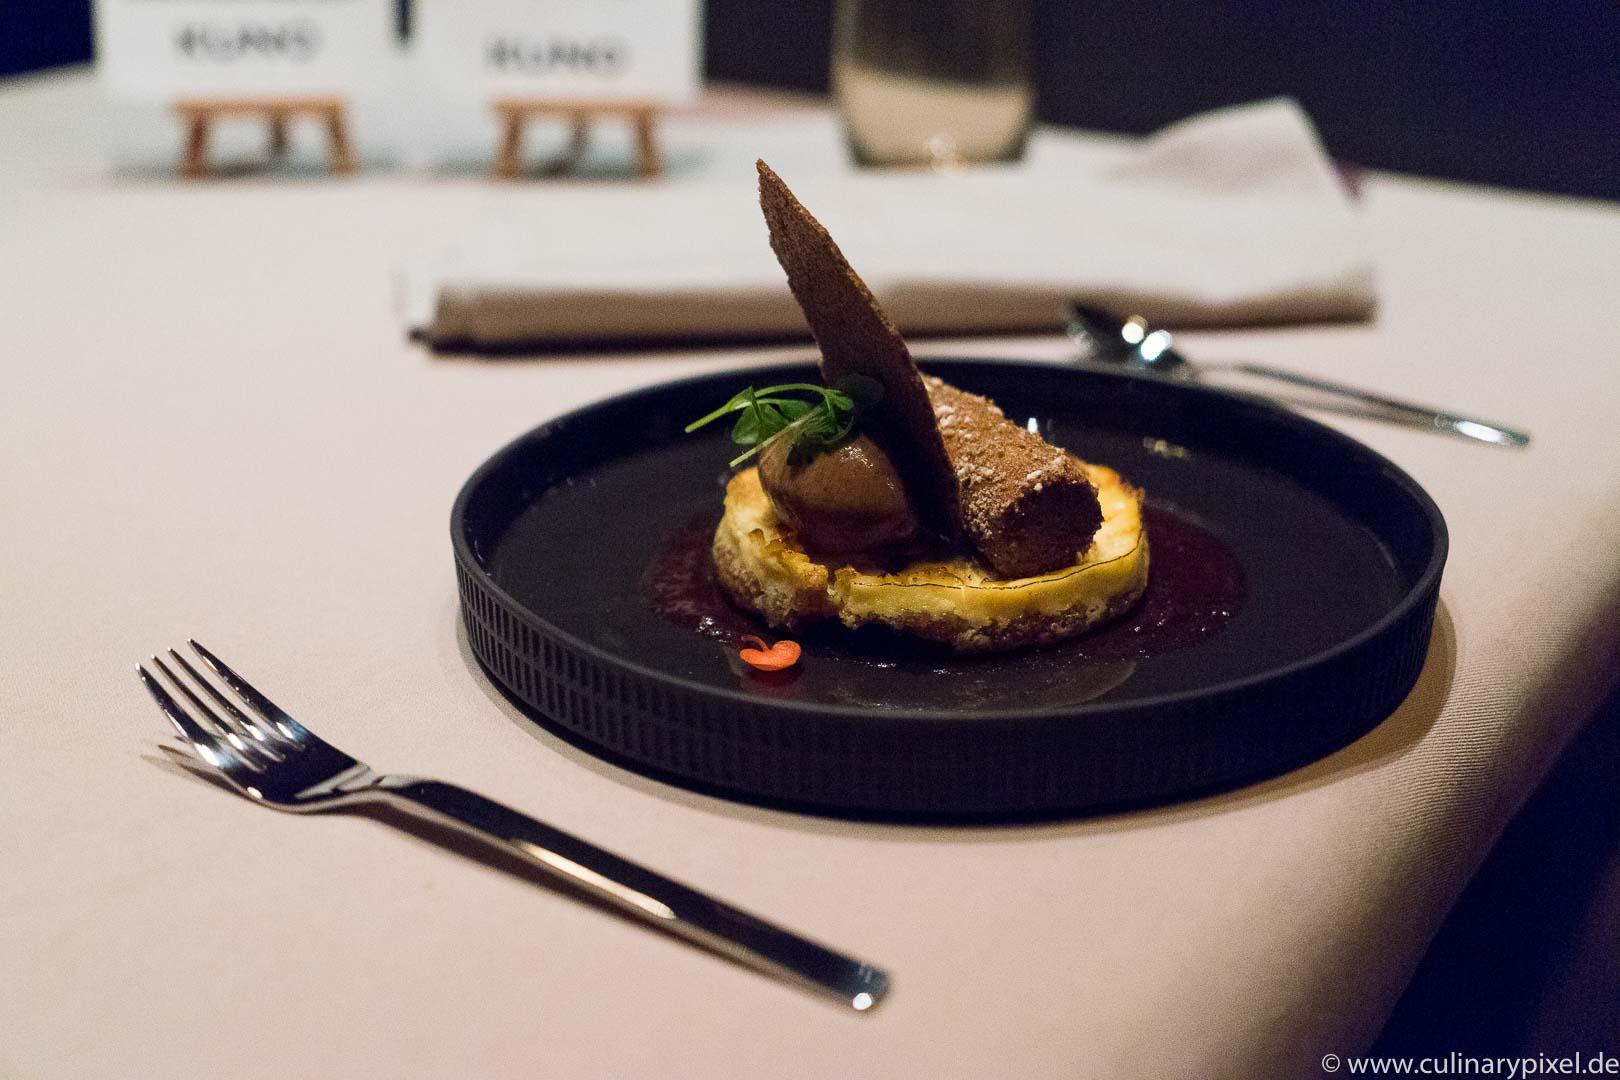 dsc02584 culinary pixel food blog rezepte wein restaurants genuss. Black Bedroom Furniture Sets. Home Design Ideas